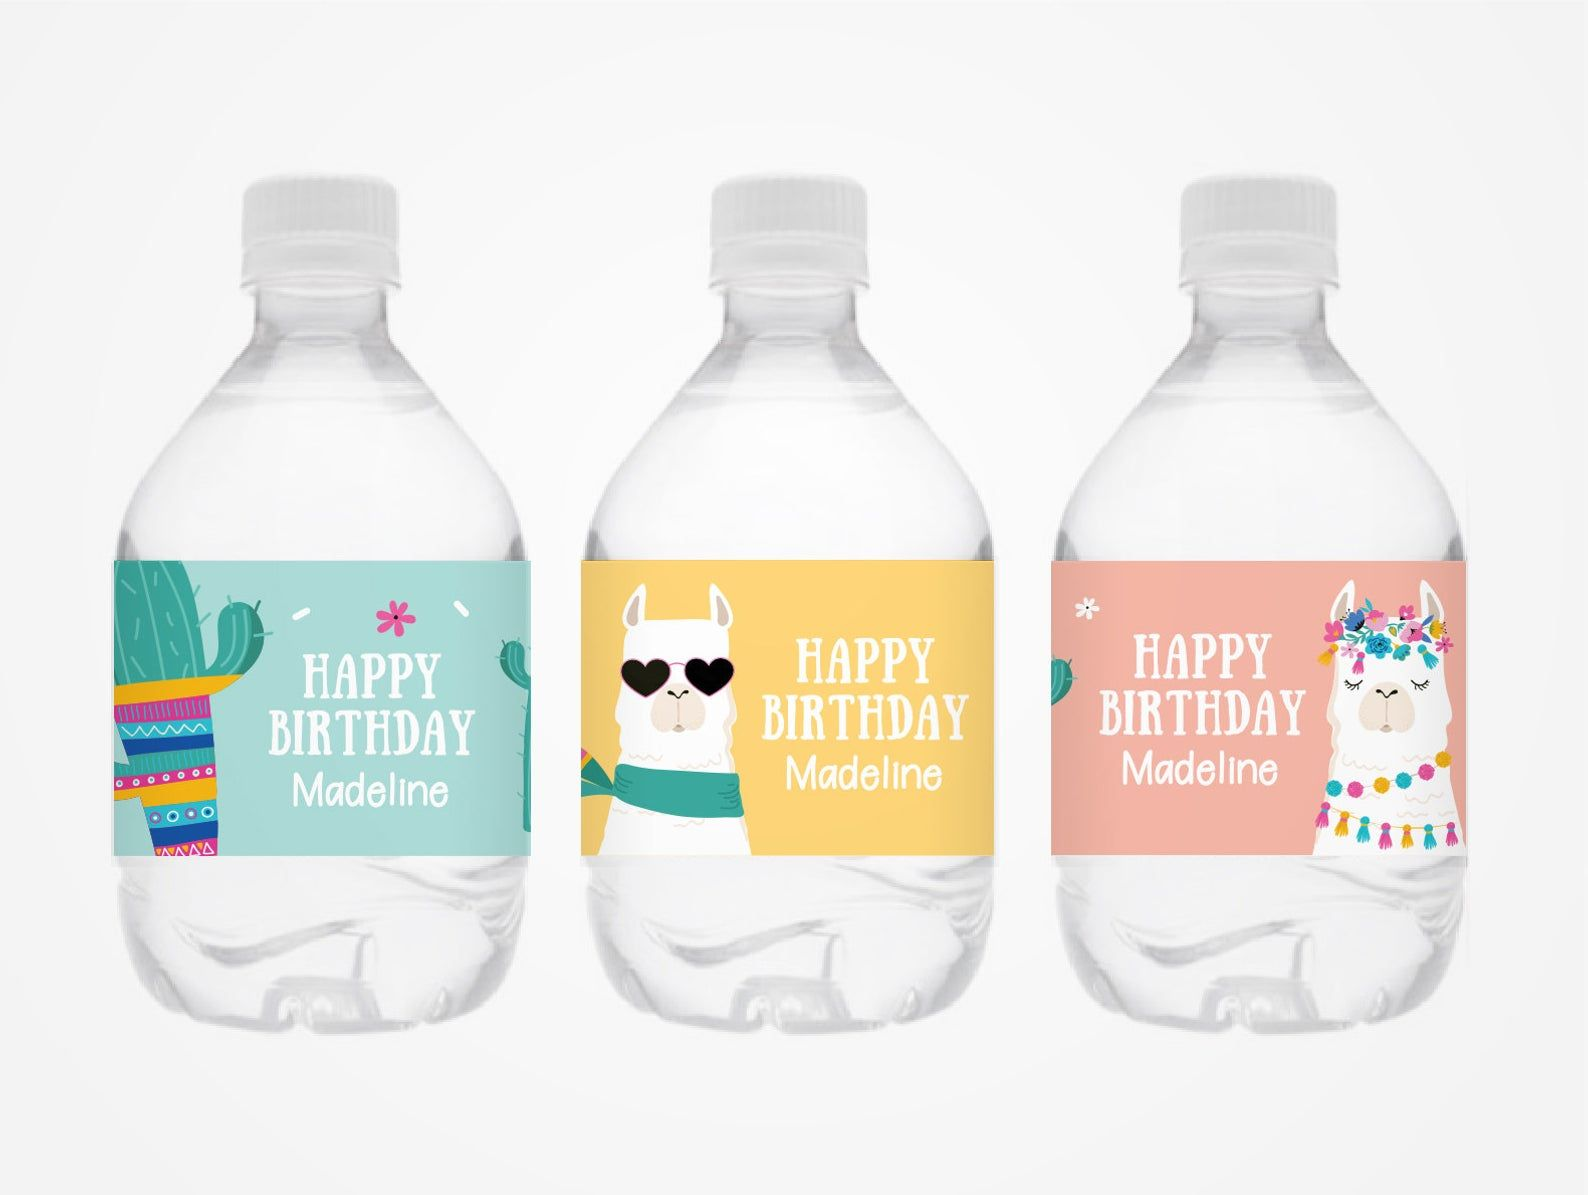 Llama Party Water Bottle Labels Instant Template Download Water Party Bottle Labels Mini Water Bottles Mini water bottle label template